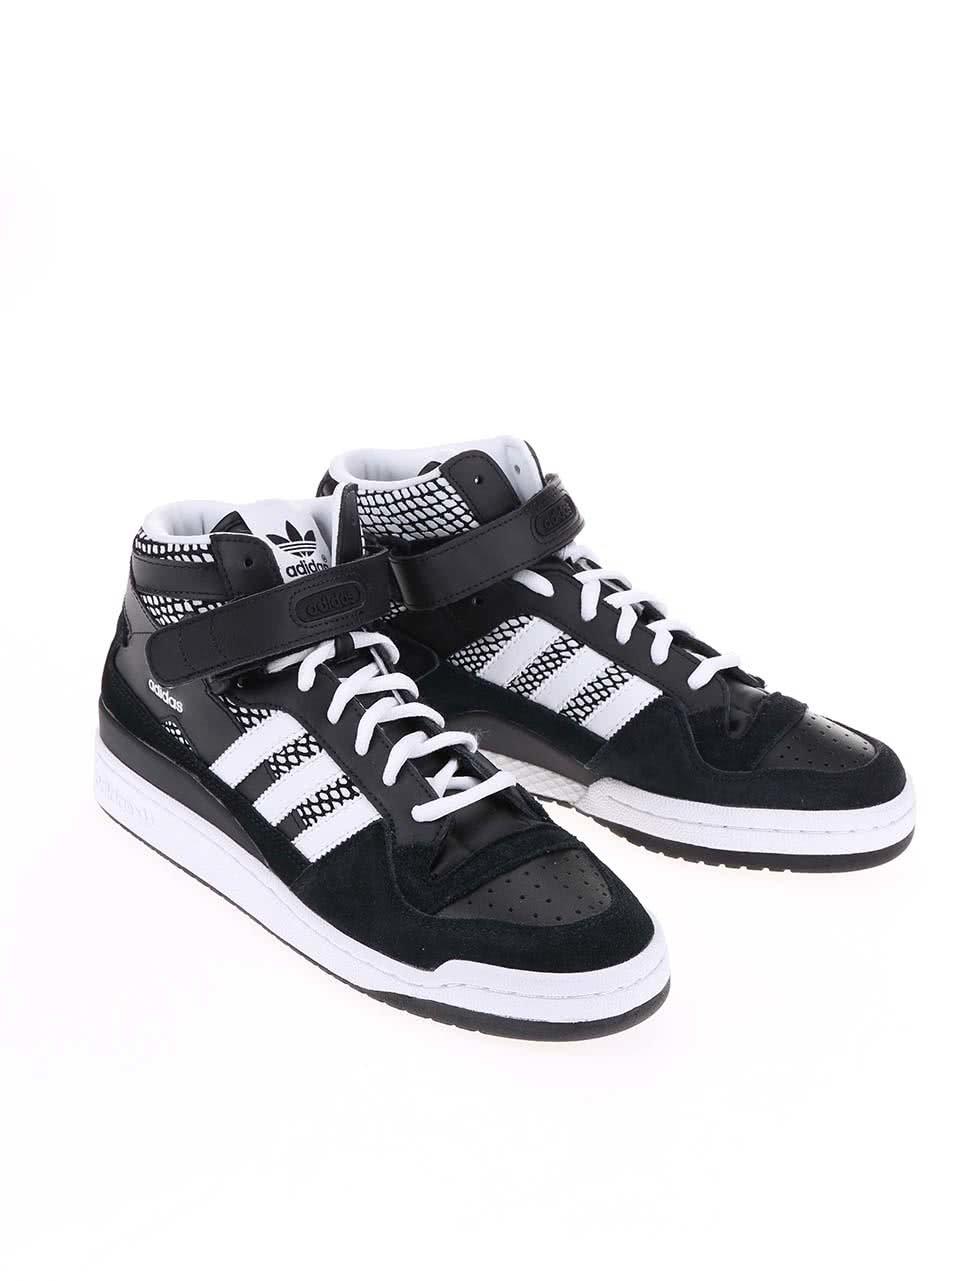 Černé pánské kotníkové tenisky adidas Originals Forum Mid RS ... b3139d7123